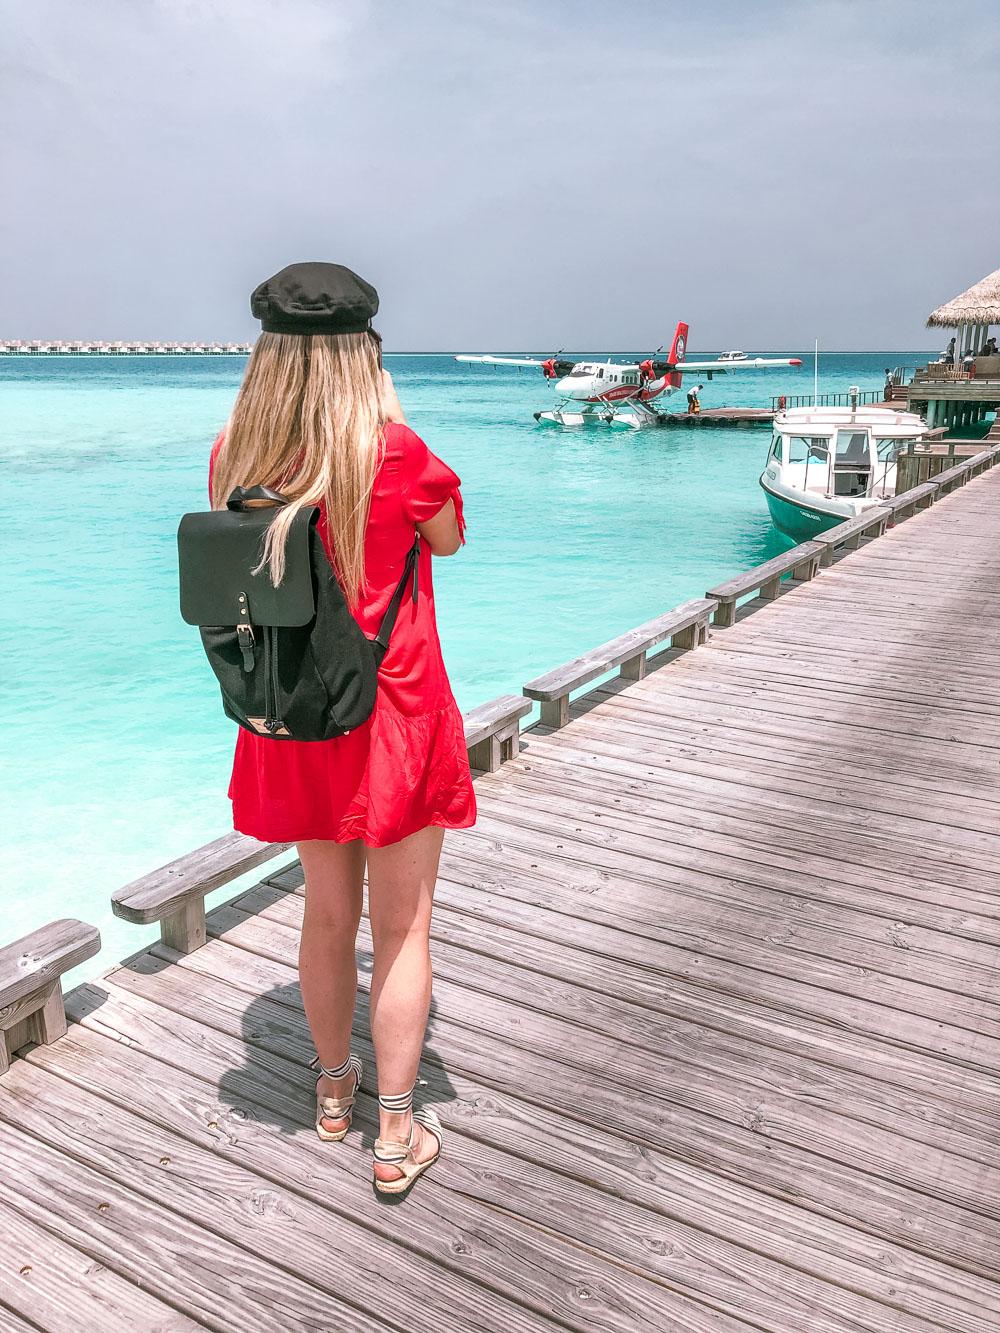 Woman on deck looking at sea plane on ocean